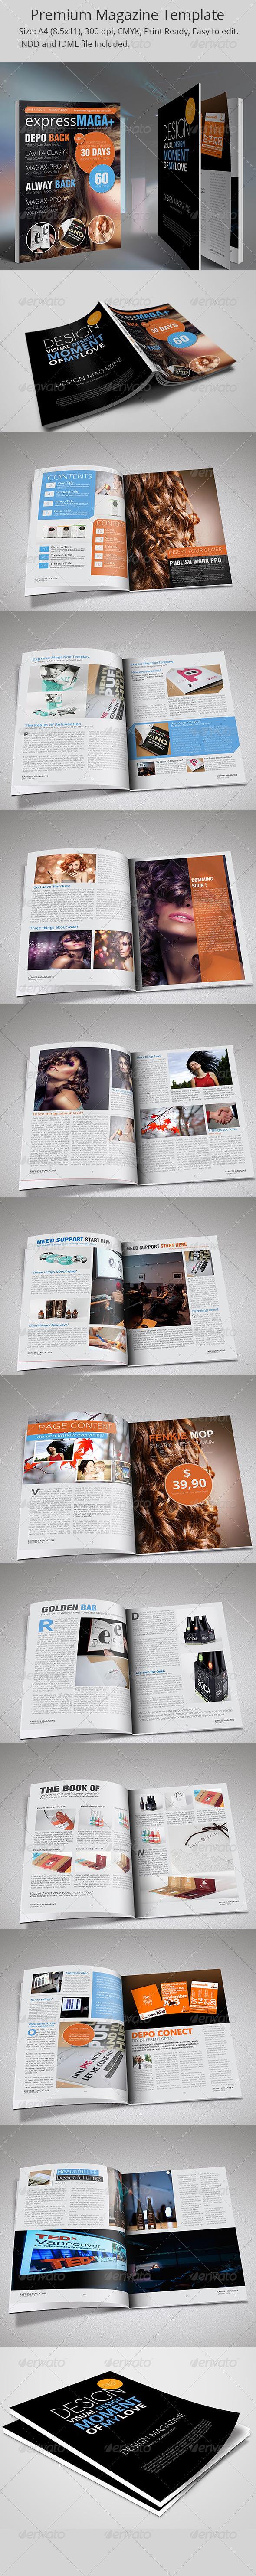 Magazine ExpressMaga Template